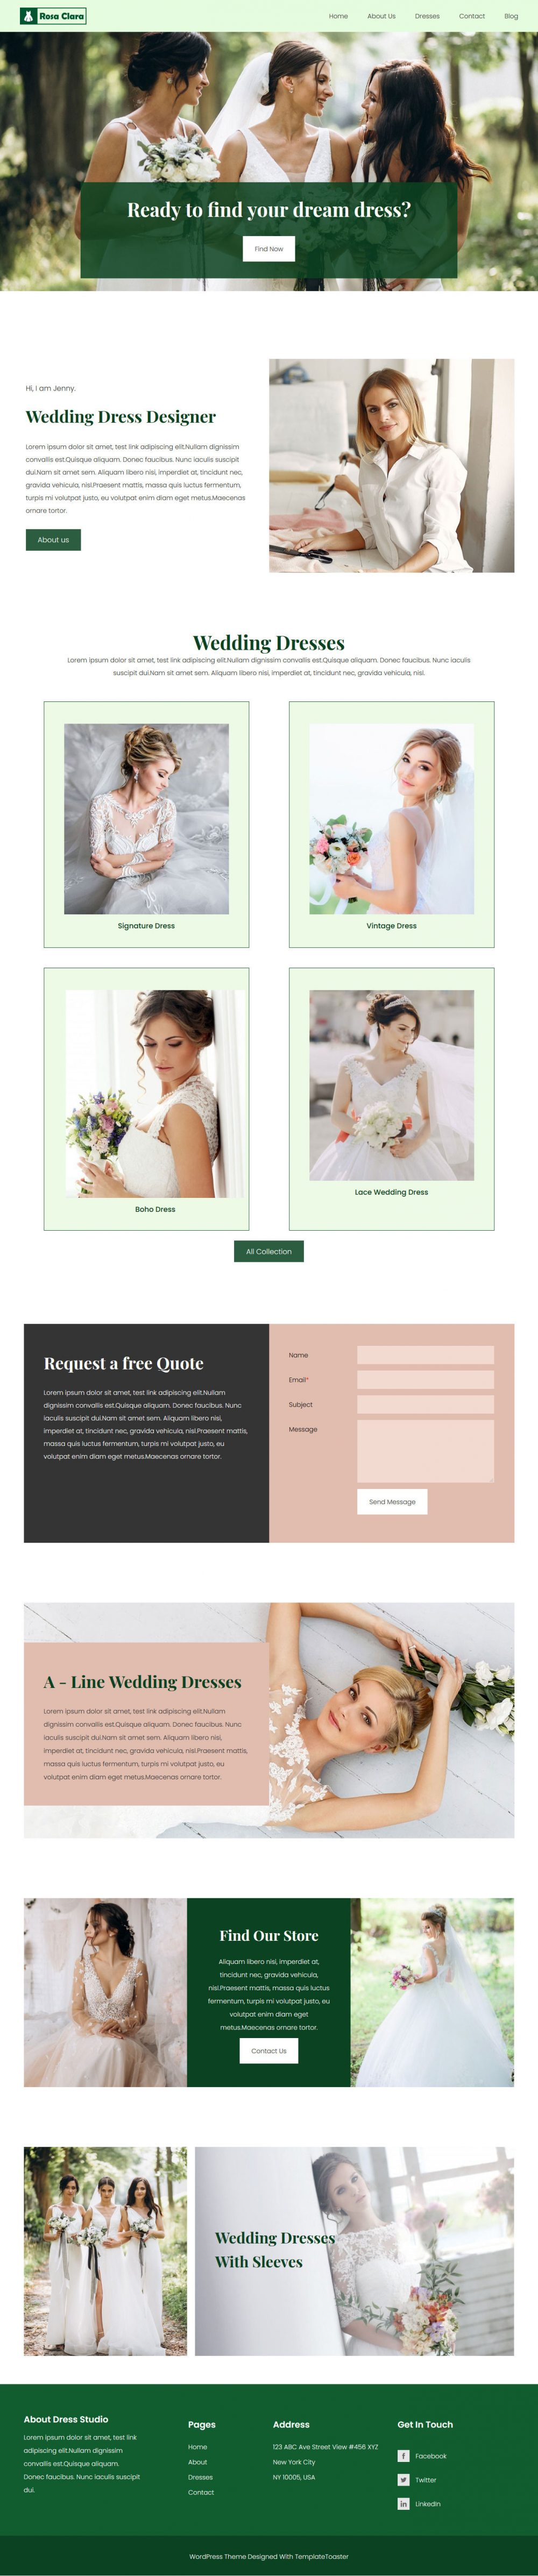 rosa clara wedding dress designer wordpress theme